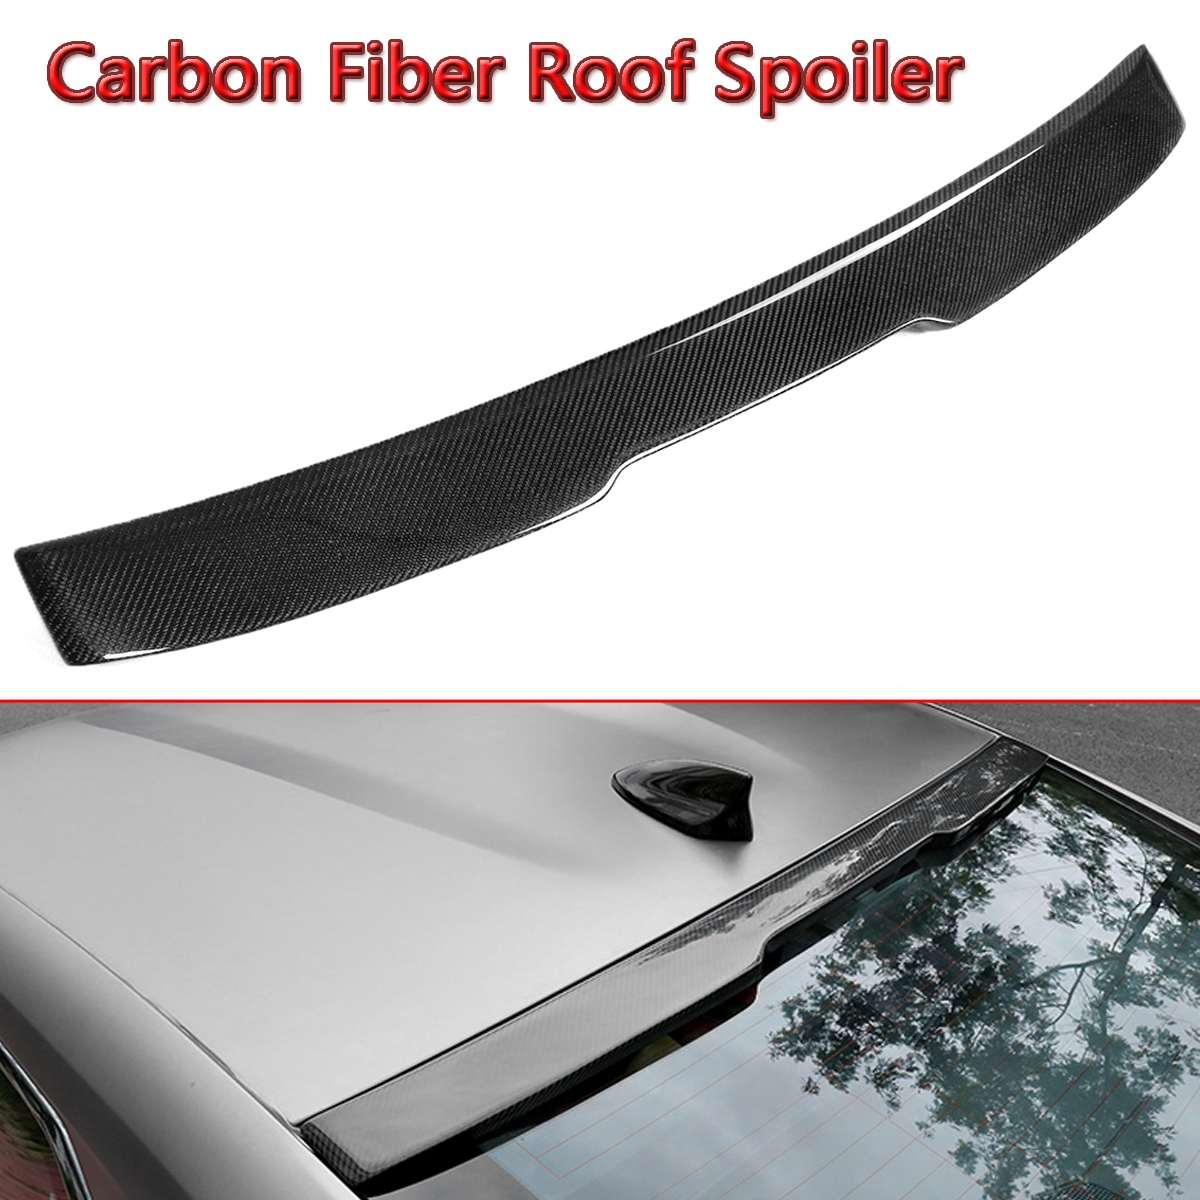 1x Carbon Fiber Dakspoiler Auto Achter Spoiler Voor Chevy Camaro Lt Rs Sport 2016-2018 Auto Spoiler Achterruitwisser Wing Auto